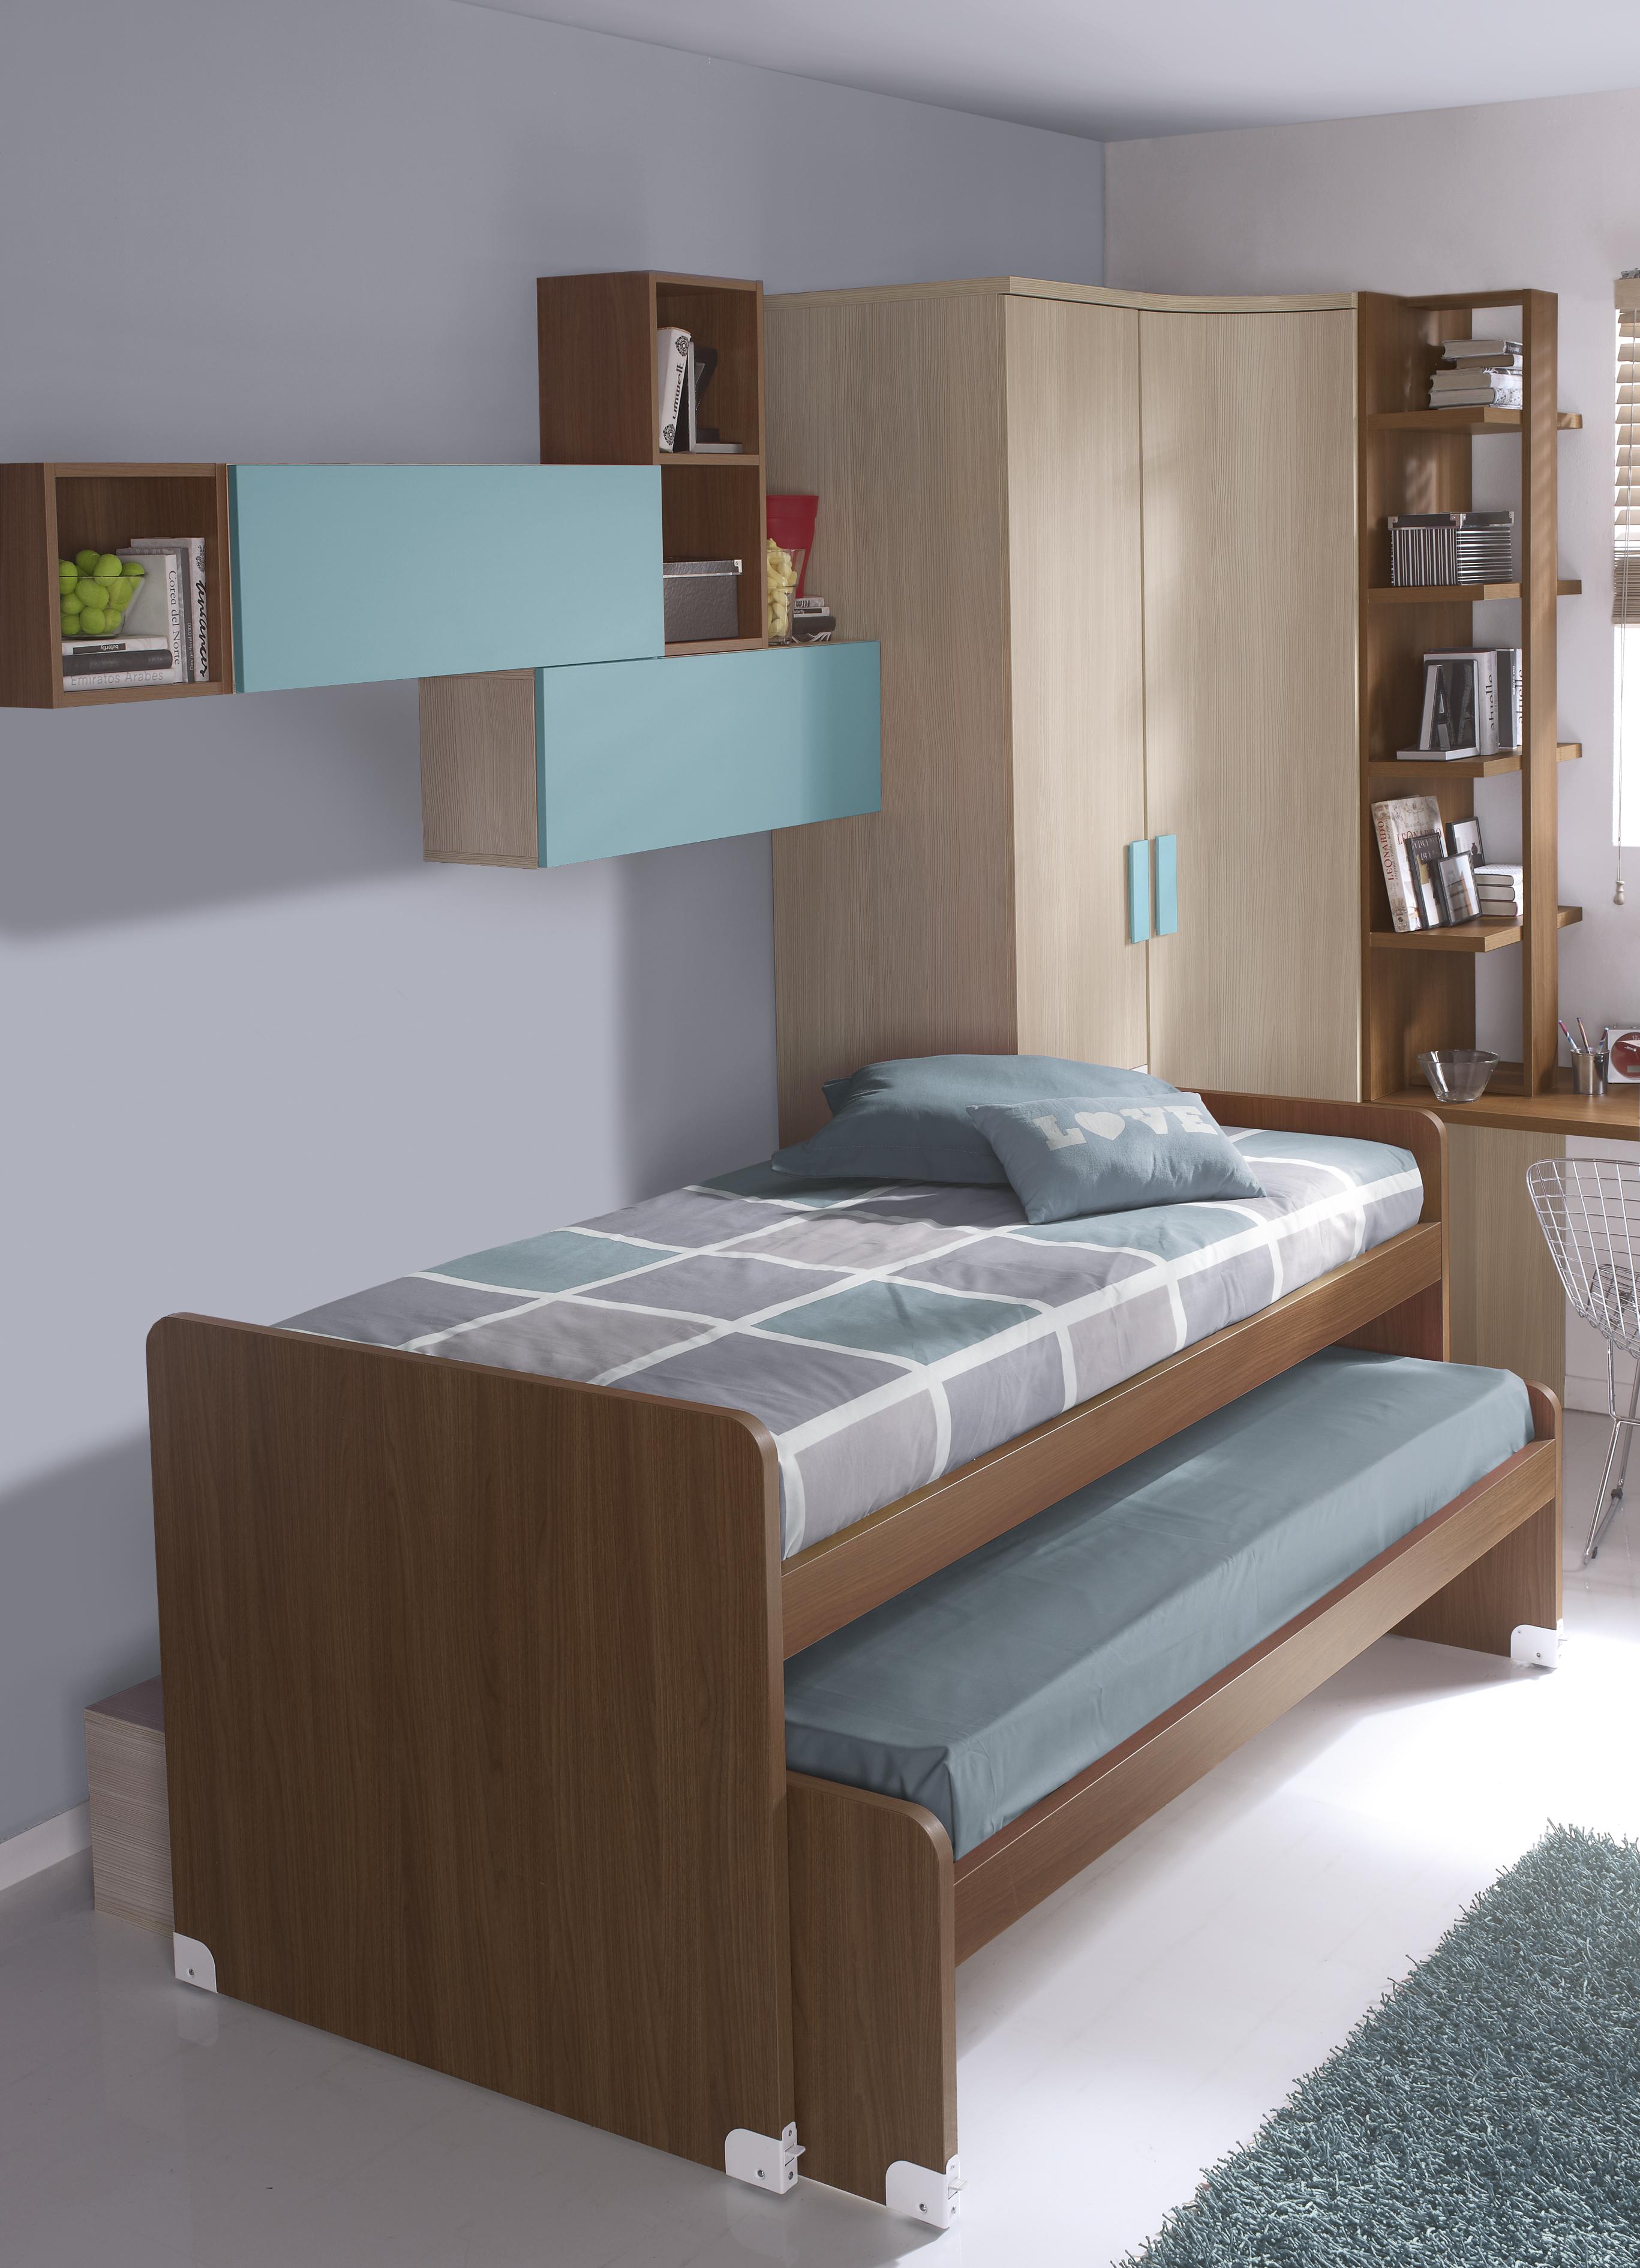 muebles habitacion juvenil pequena 20170724052708